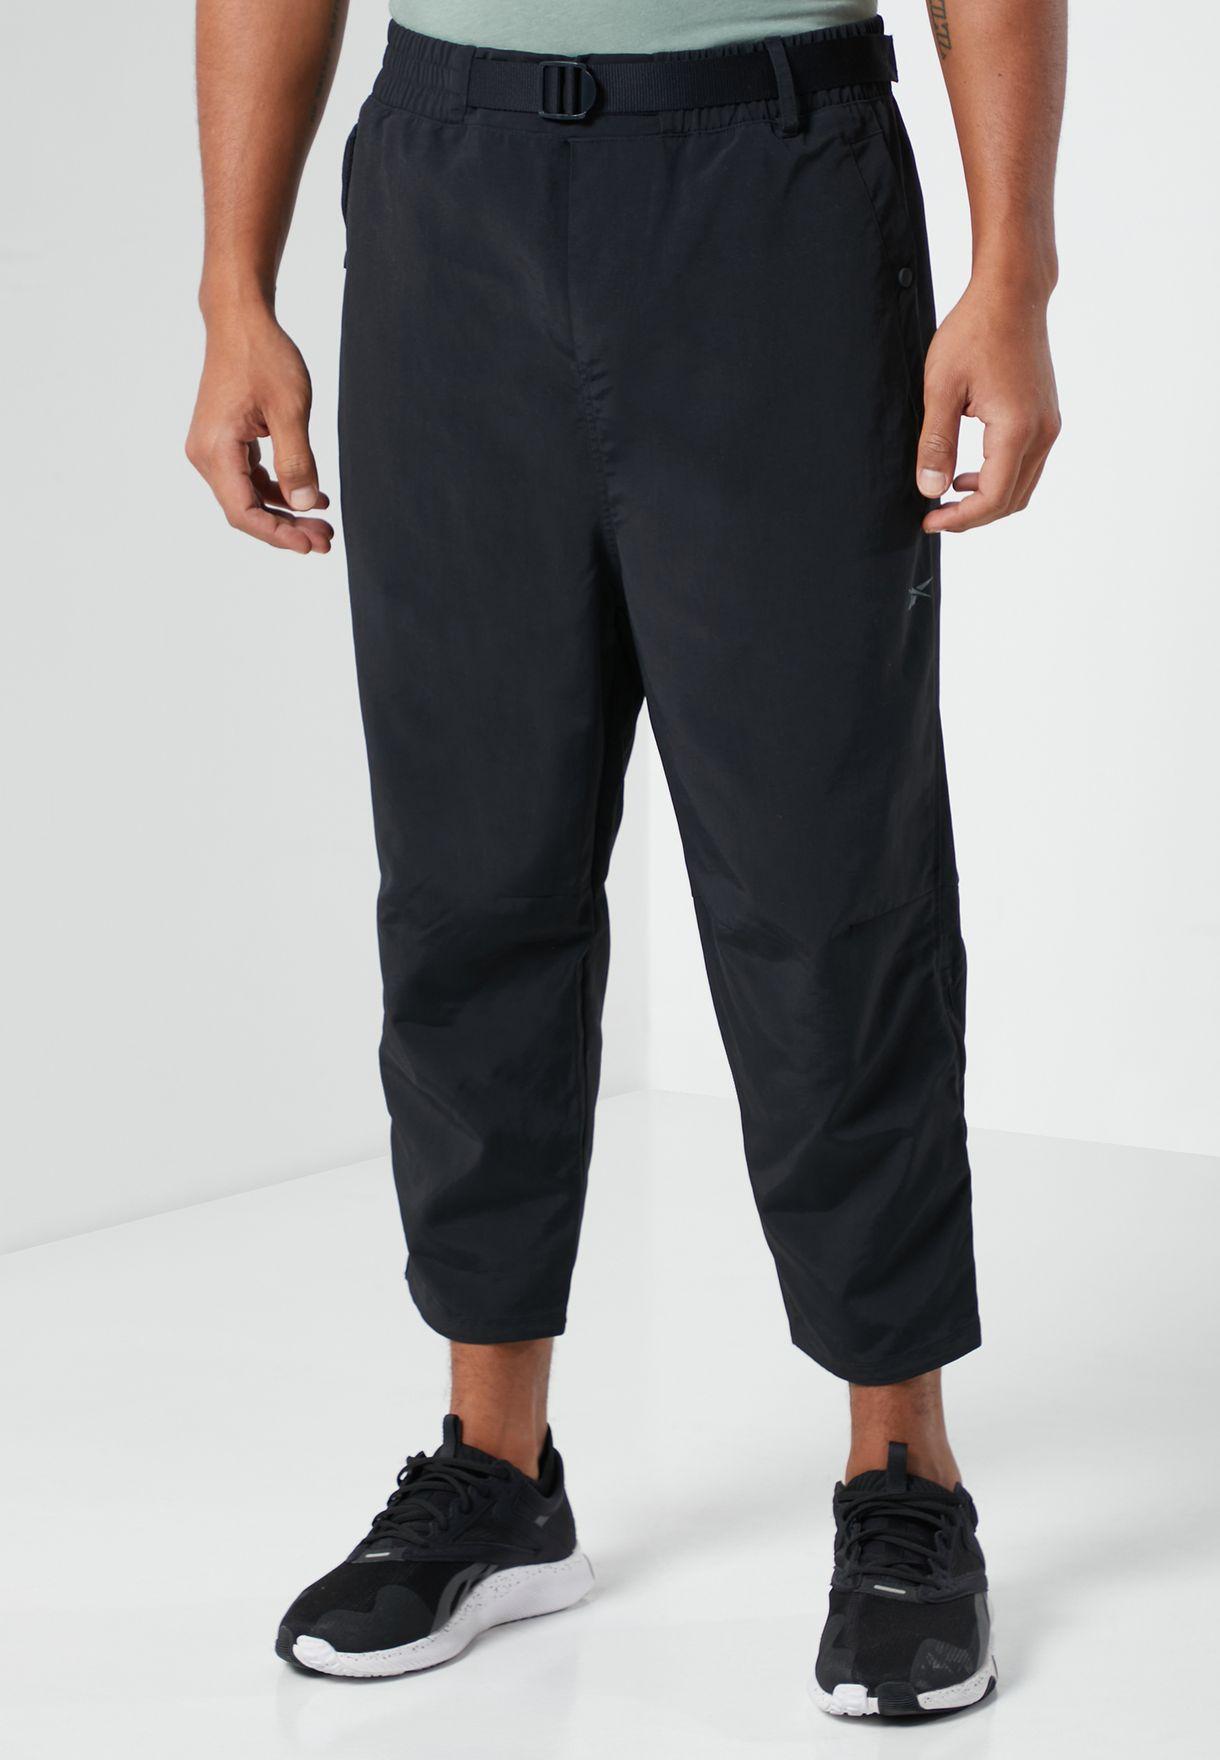 Utility Sweatpants